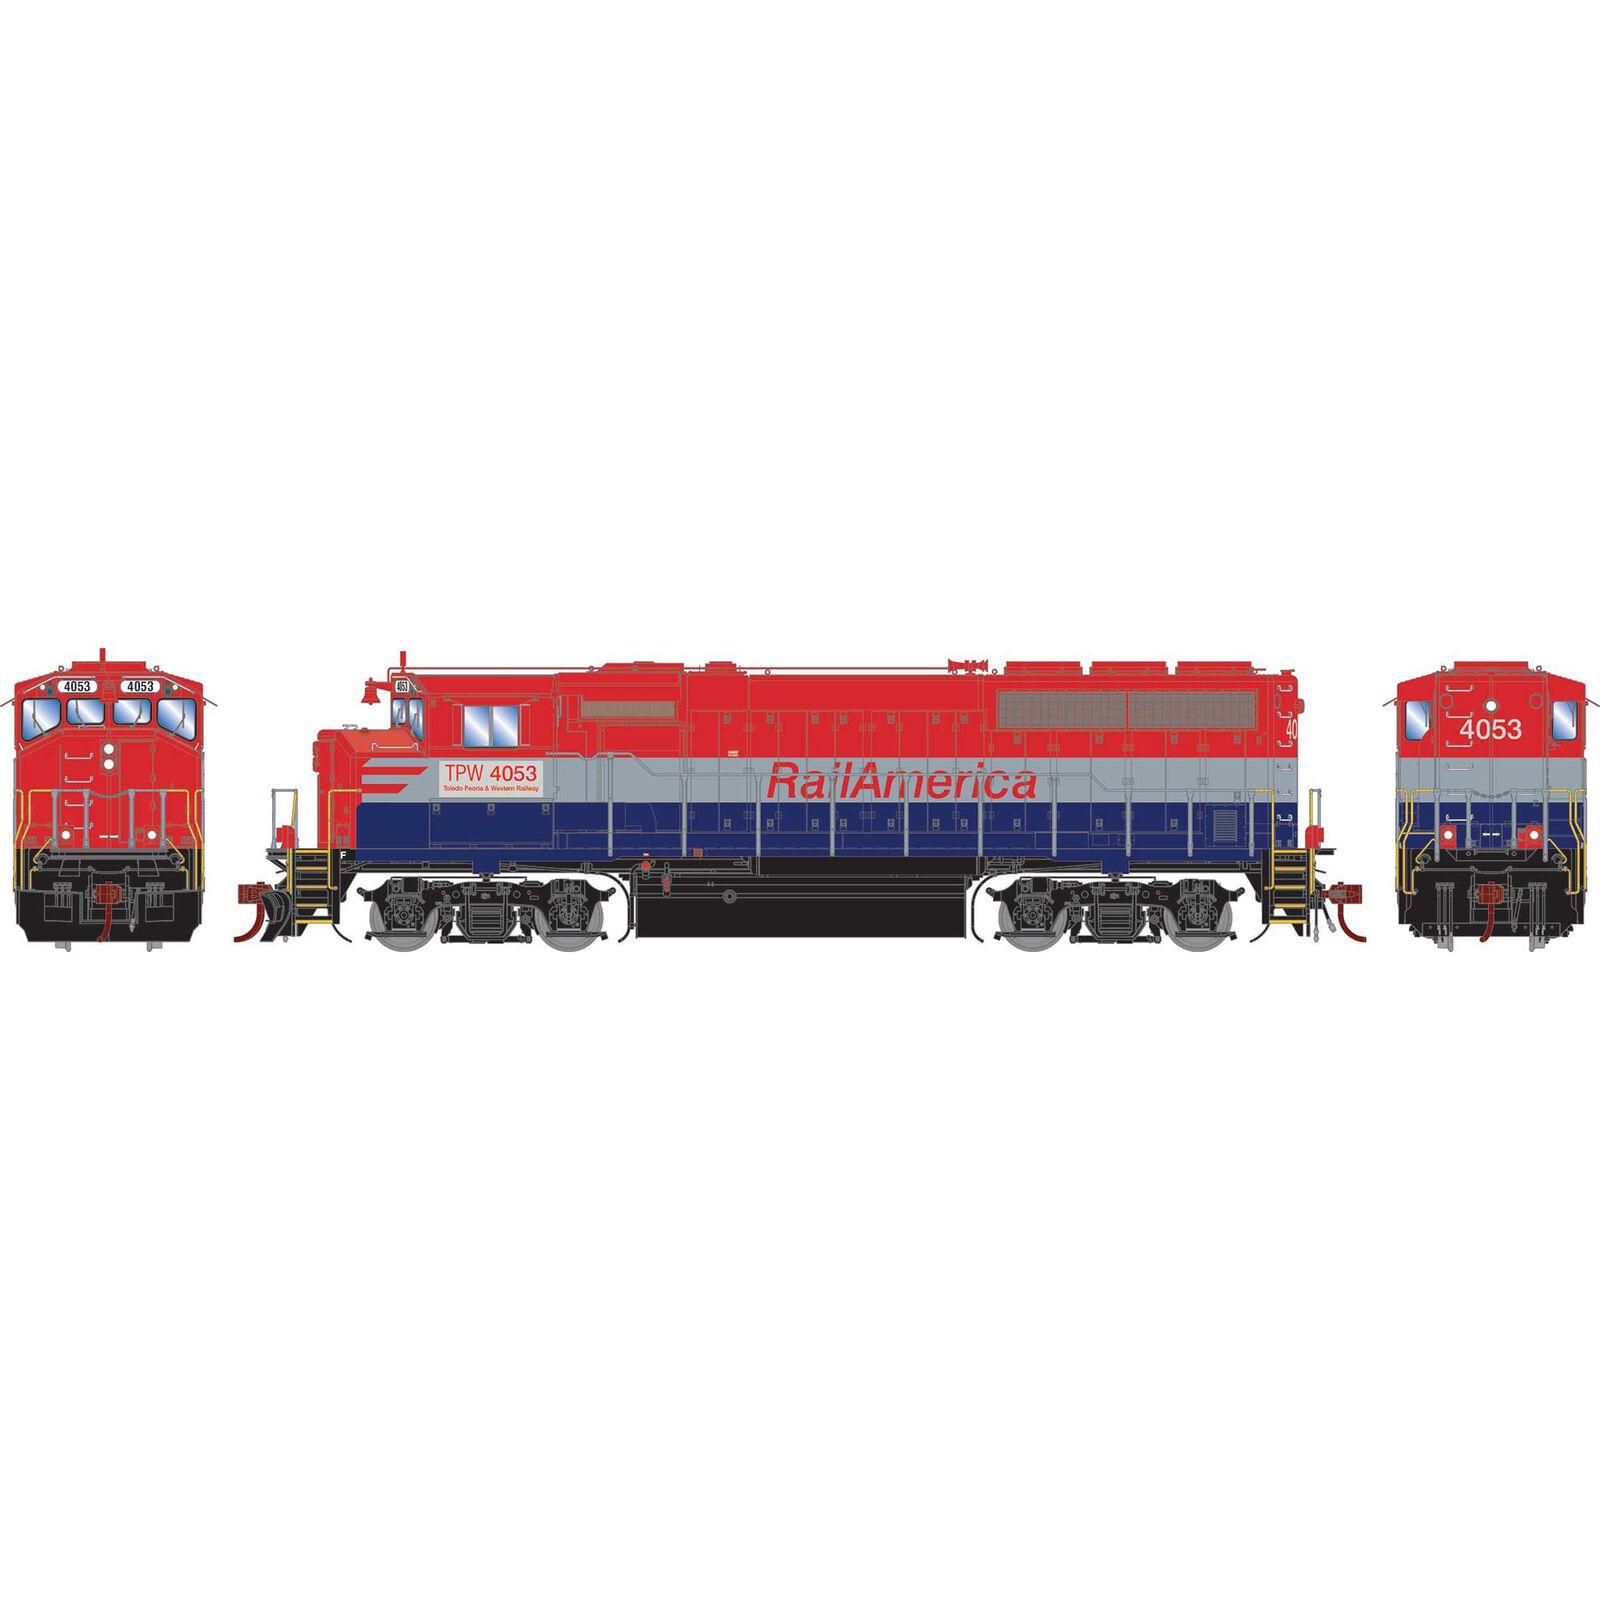 HO GP40-2L with DCC & Sound, Rail America/TP&W #4053